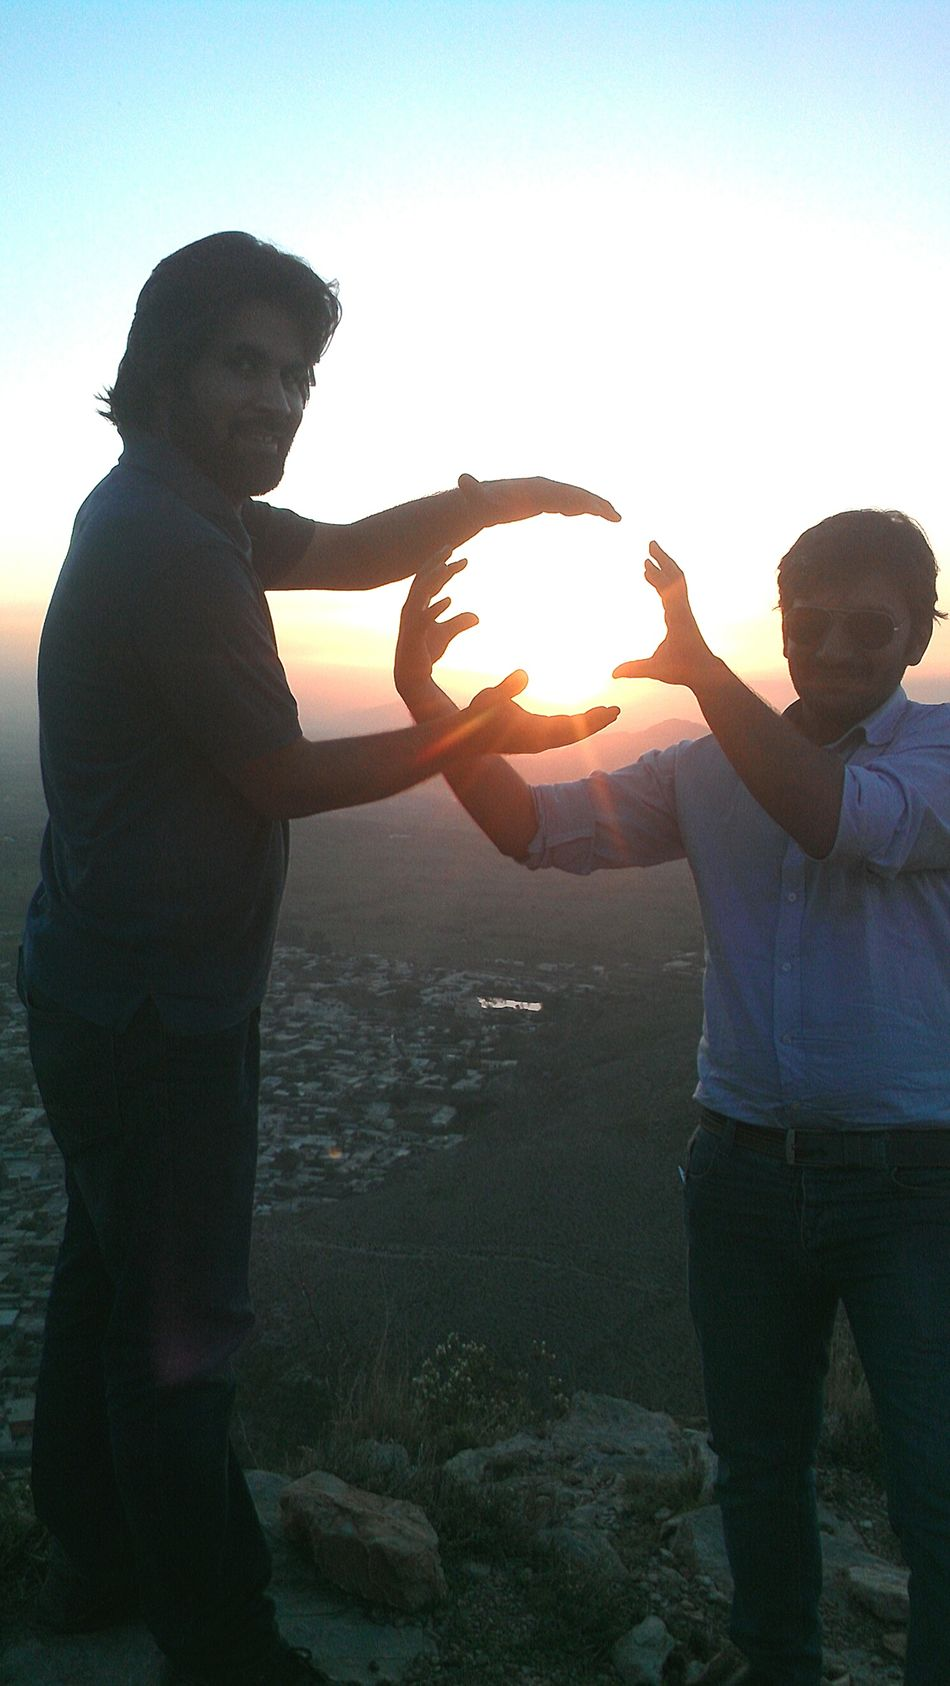 Having Fun Enjoying The Sun With Friends